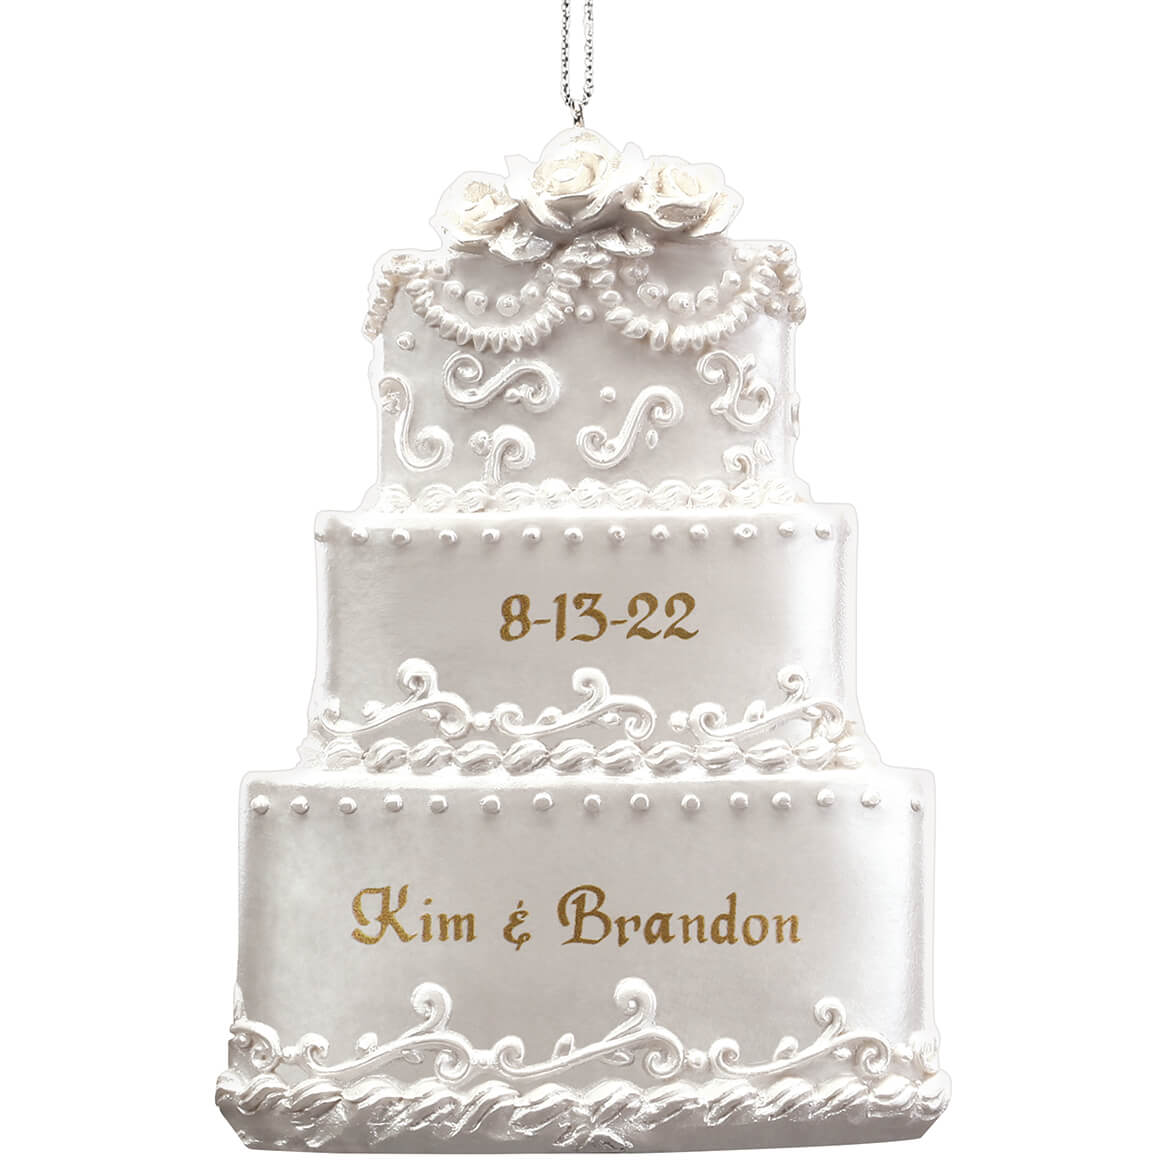 Personalized Wedding Cake Ornament